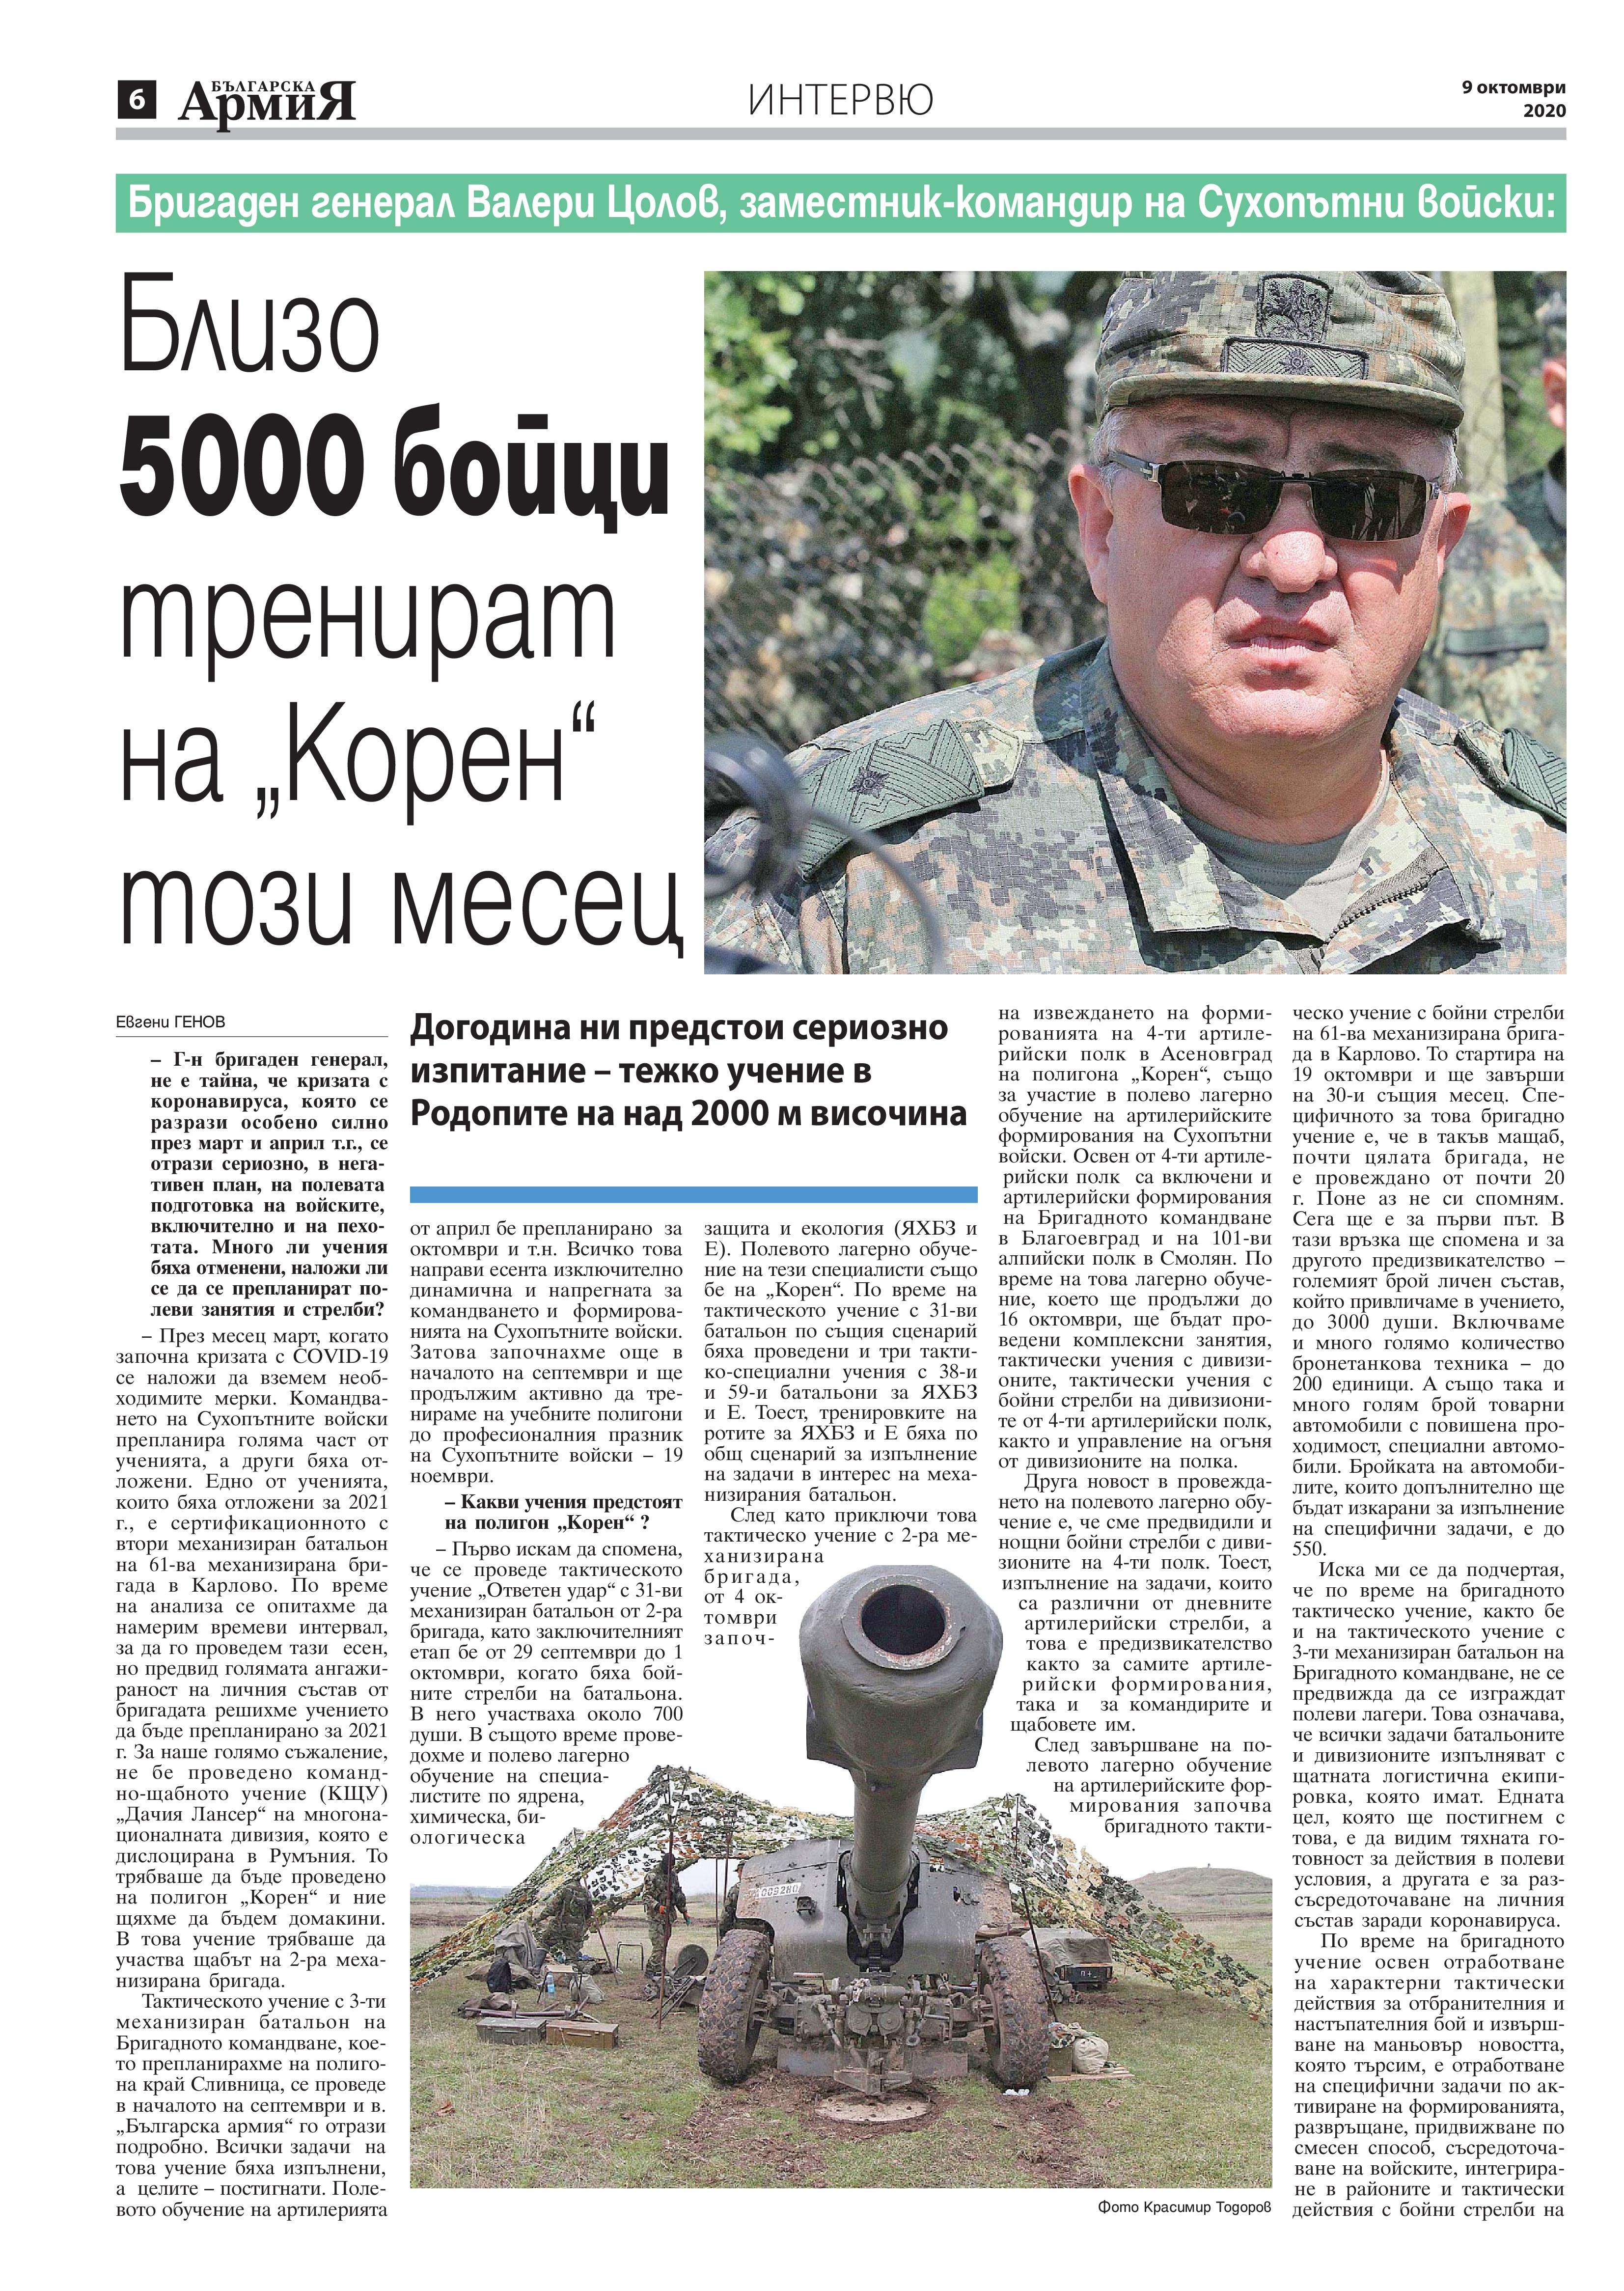 https://armymedia.bg/wp-content/uploads/2015/06/06-42.jpg